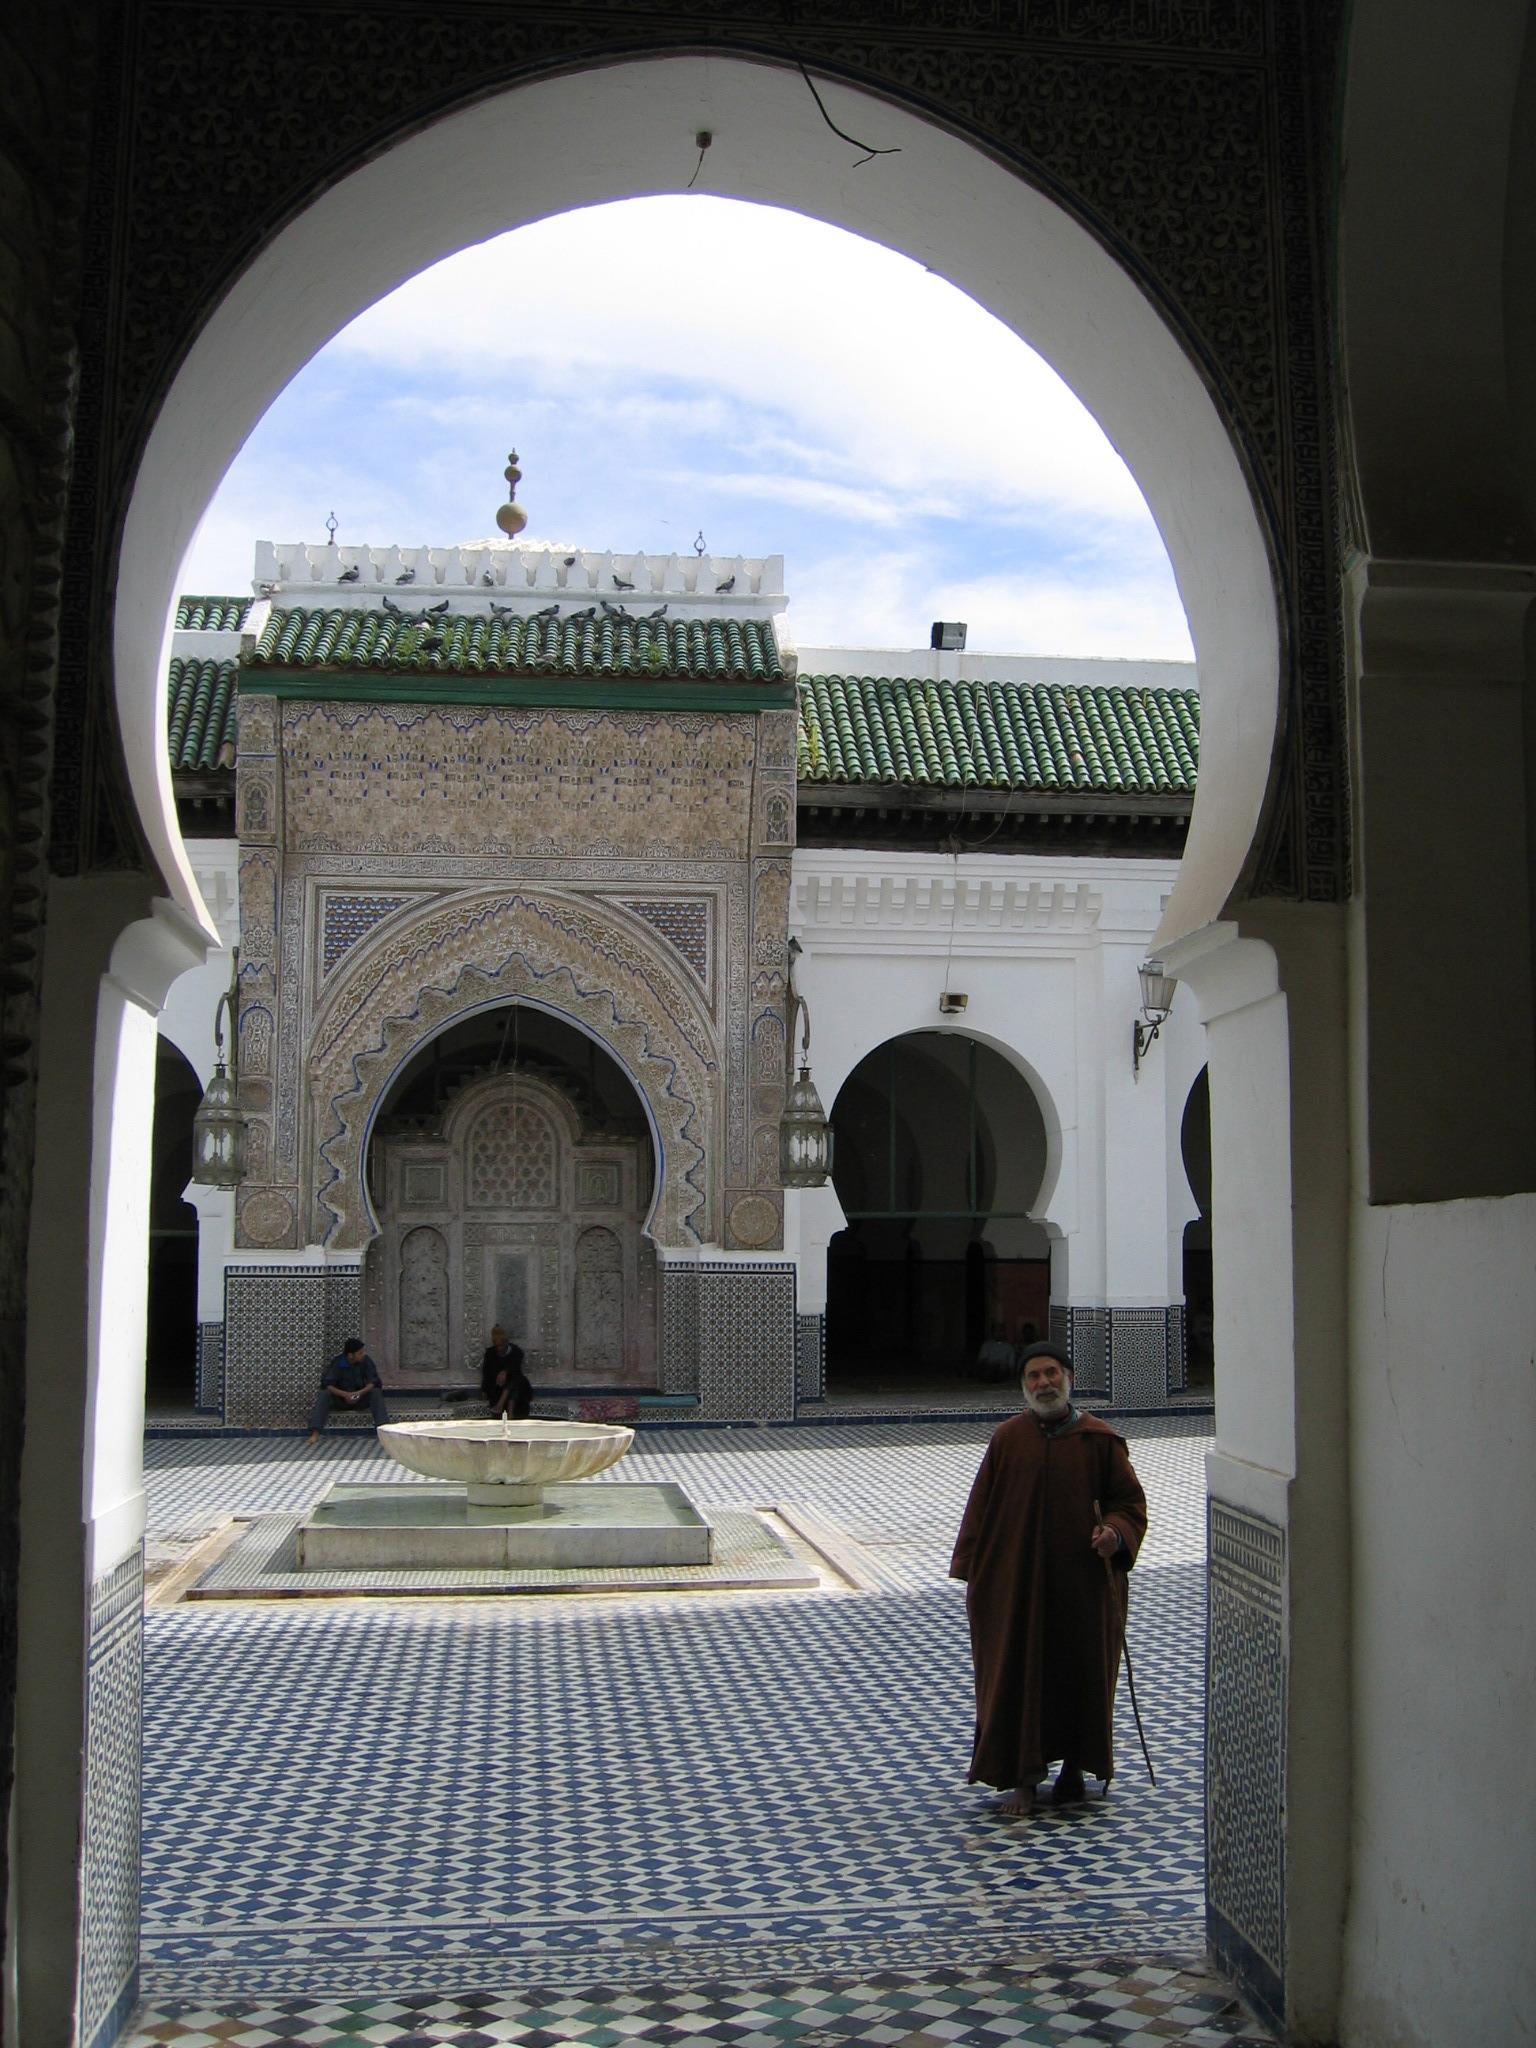 Universidad de Qarawiyyin (Fuente: http://upload.wikimedia.org)